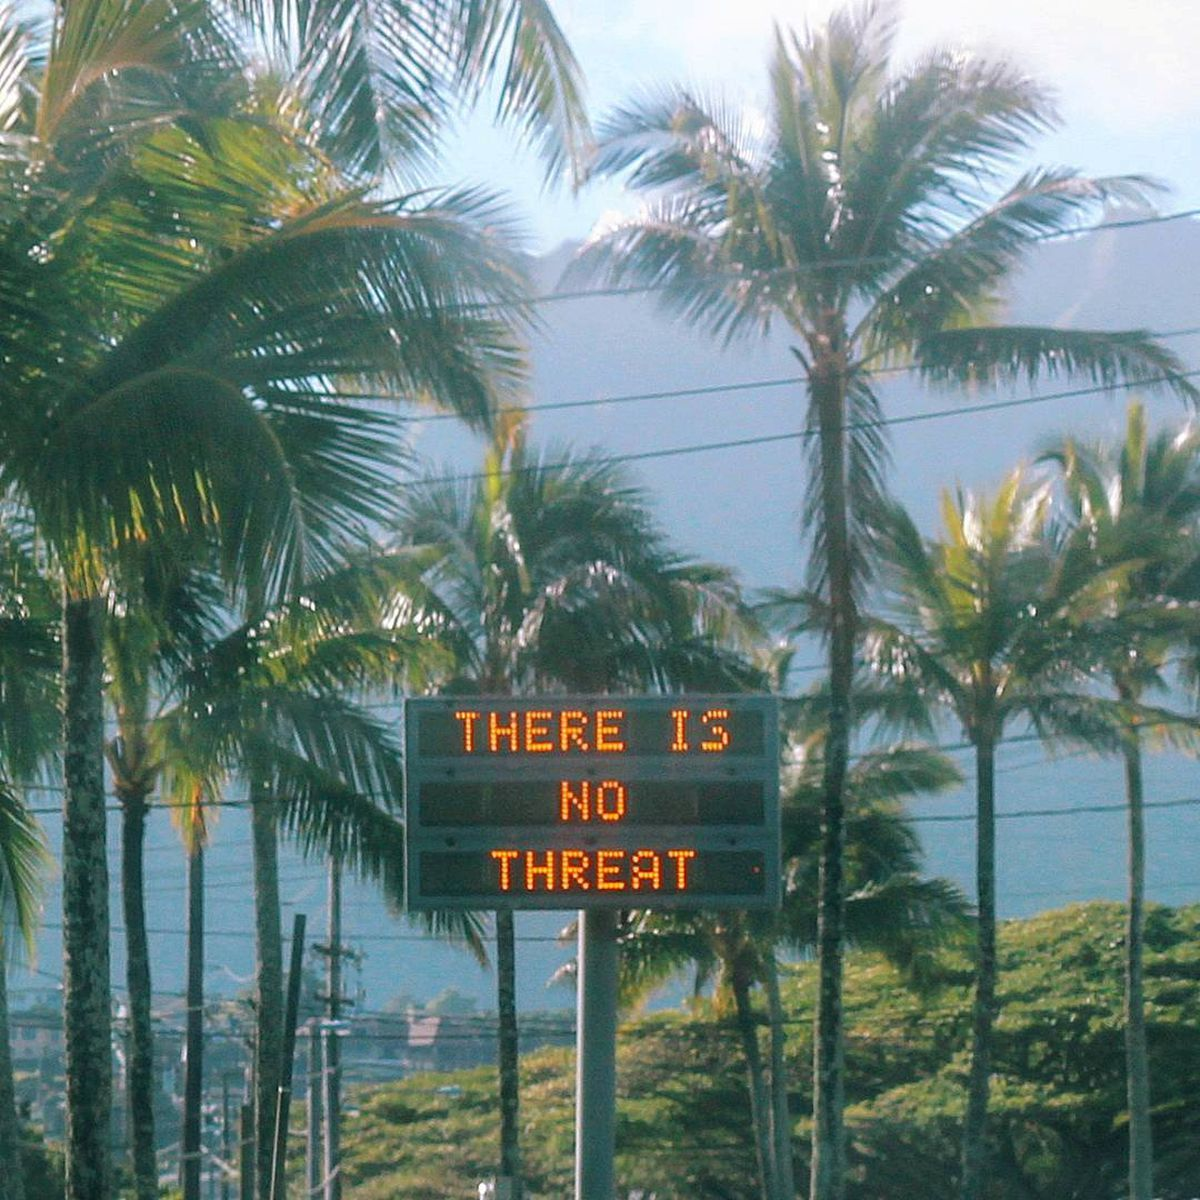 An electronic signon Oahu after a false emergency alert Jan. 13 said a ballistic missile was headed for Hawaii. Instagram/@sighpoutshrug/via REUTERS